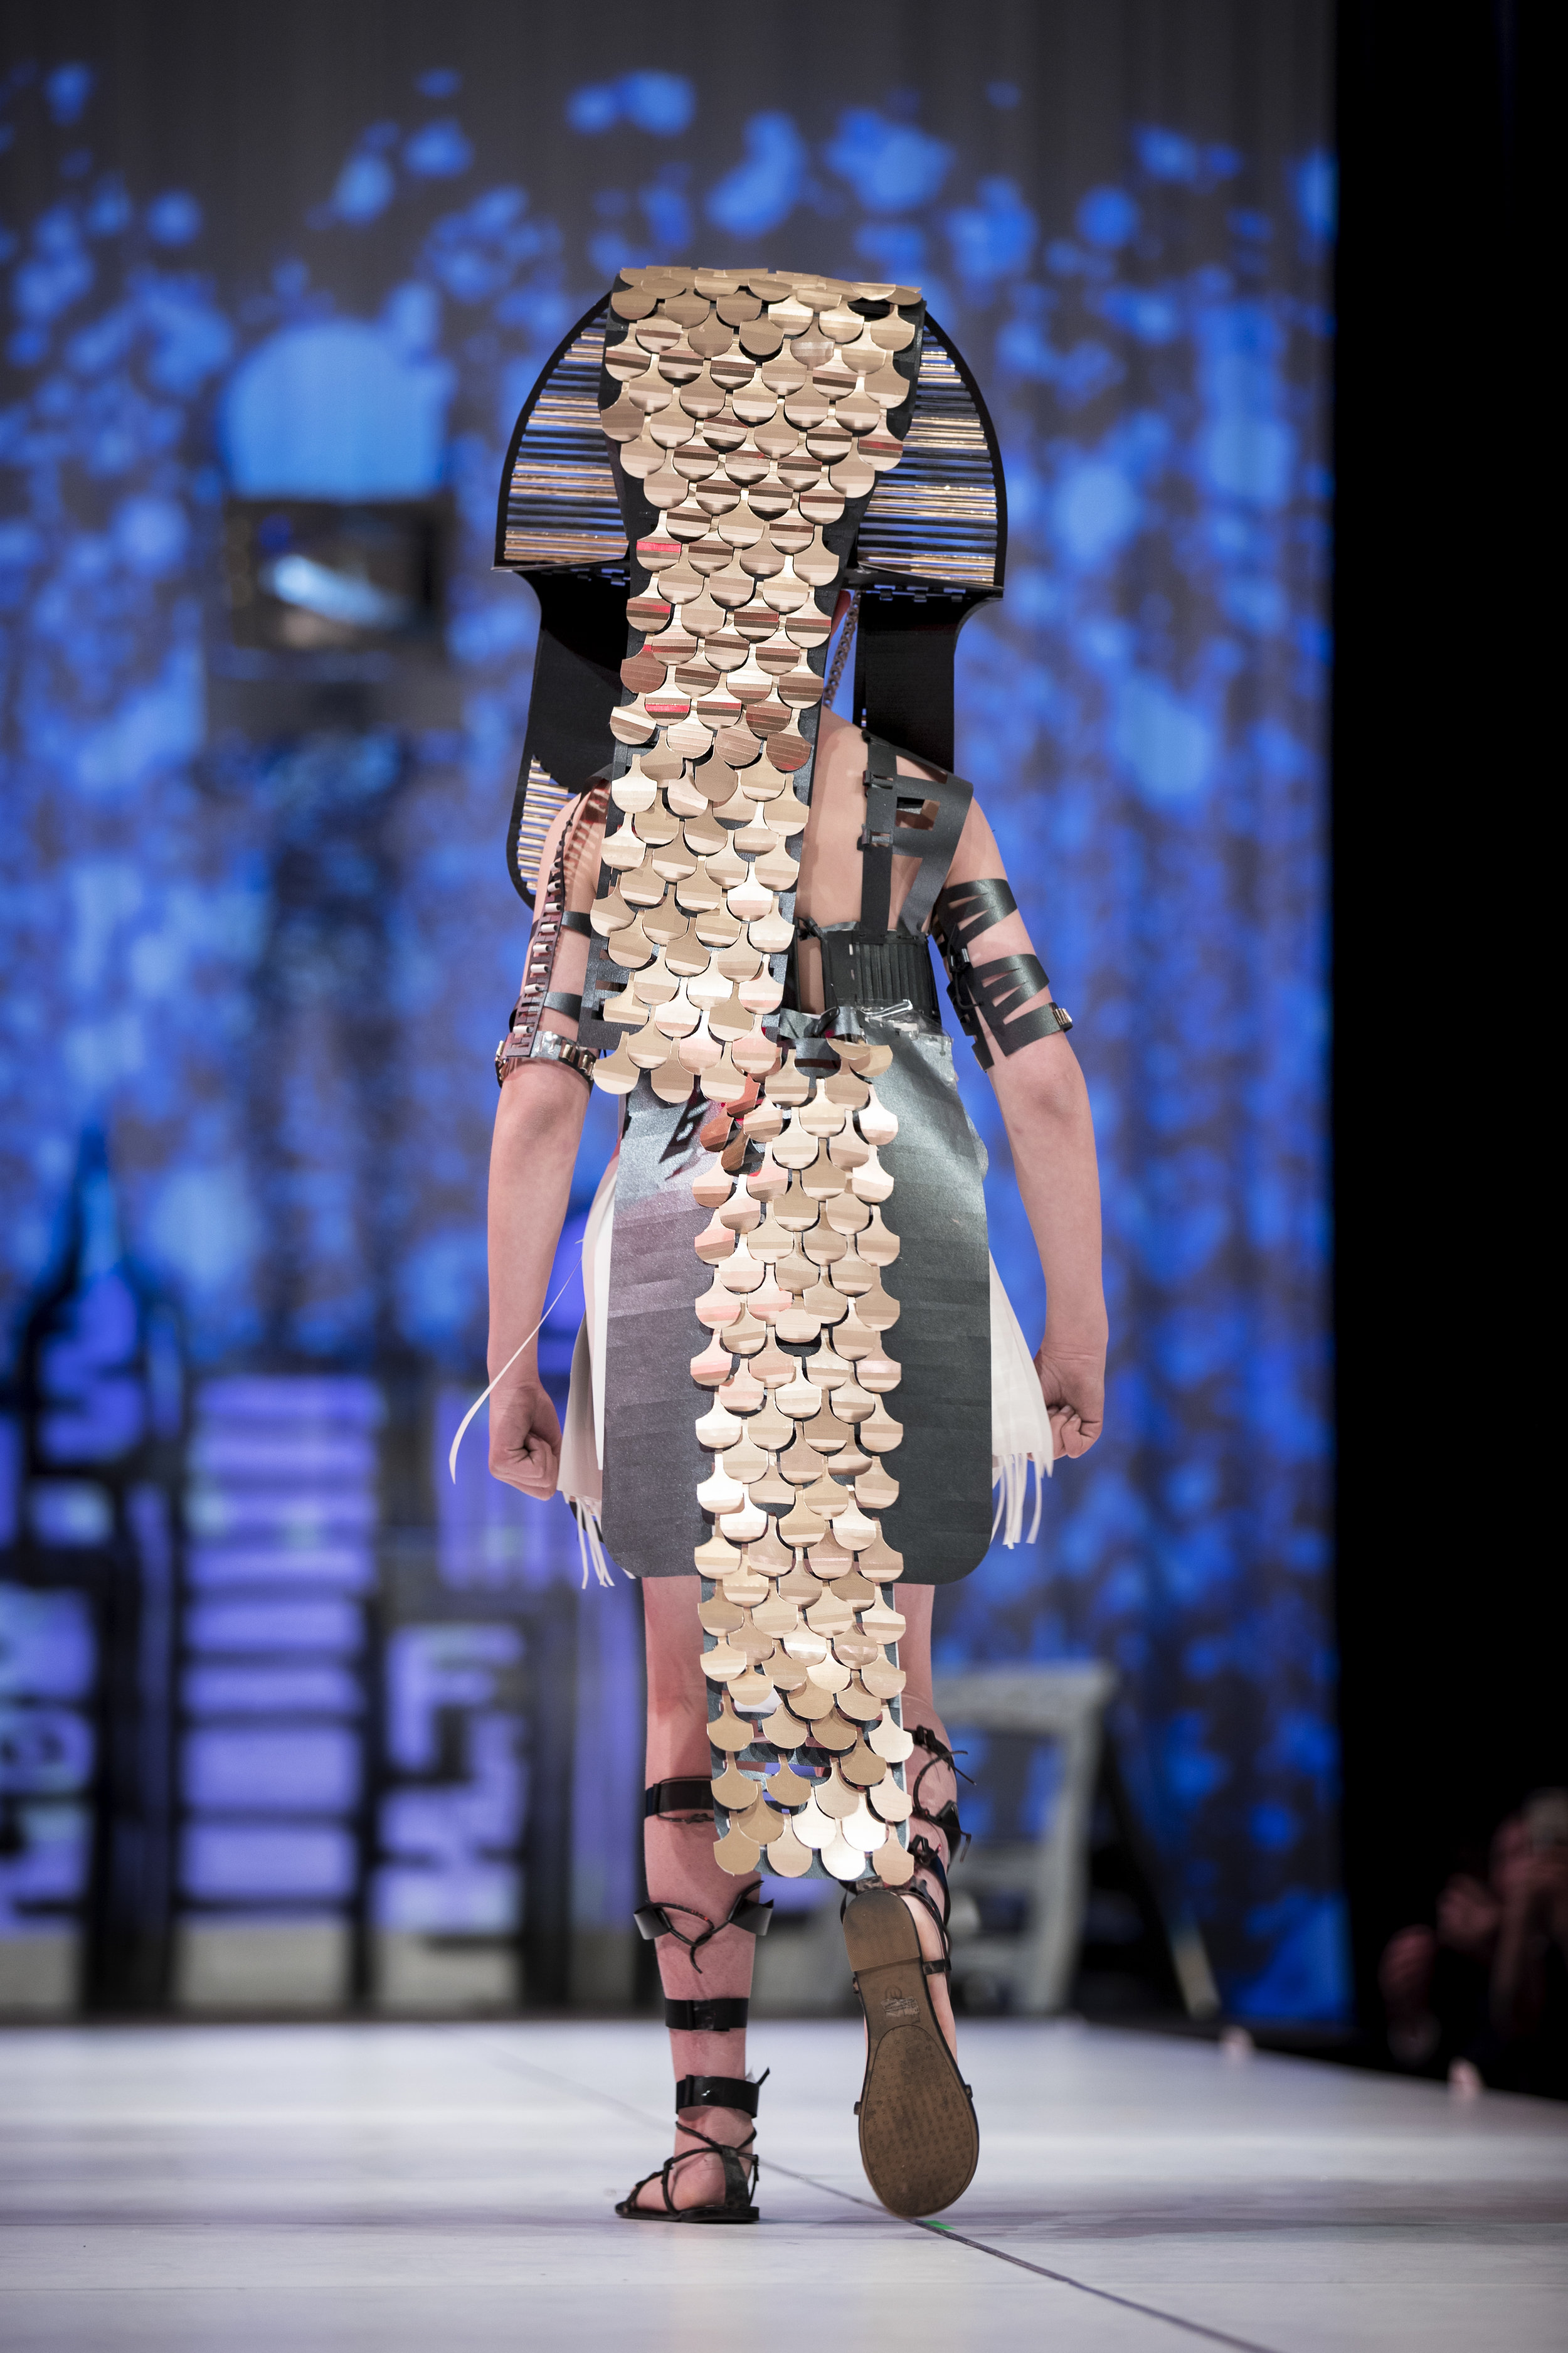 2018 Paper Fashion Show - 054.jpg